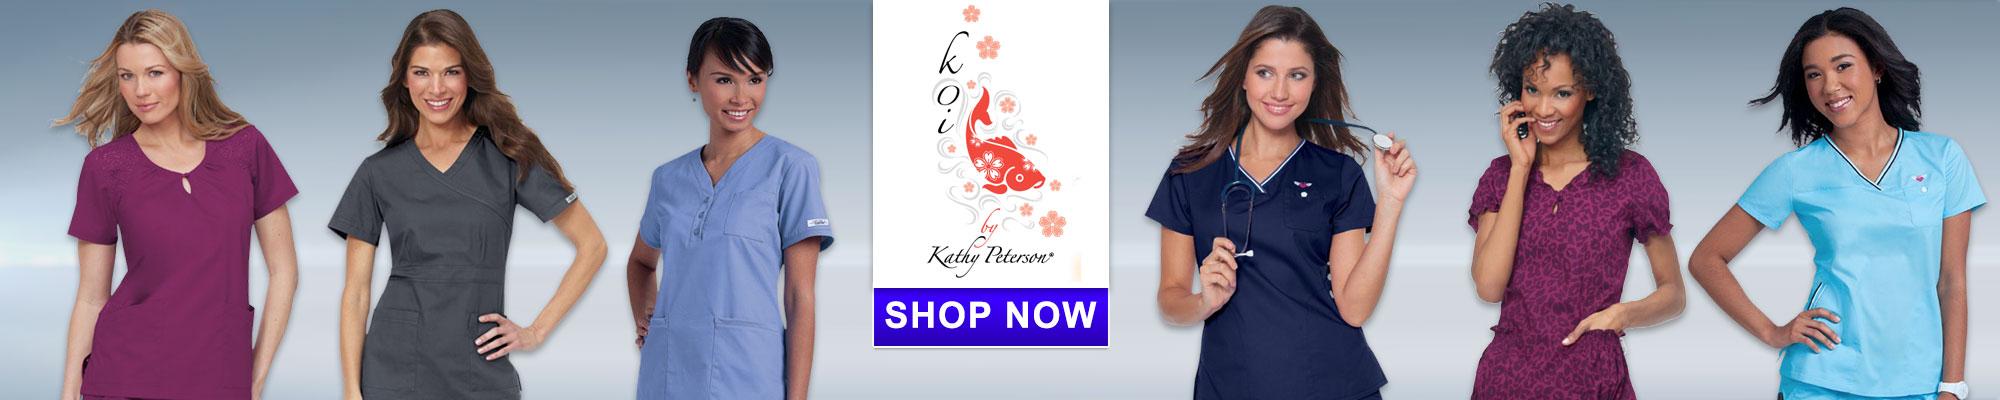 Shop Koi Scrub apparel